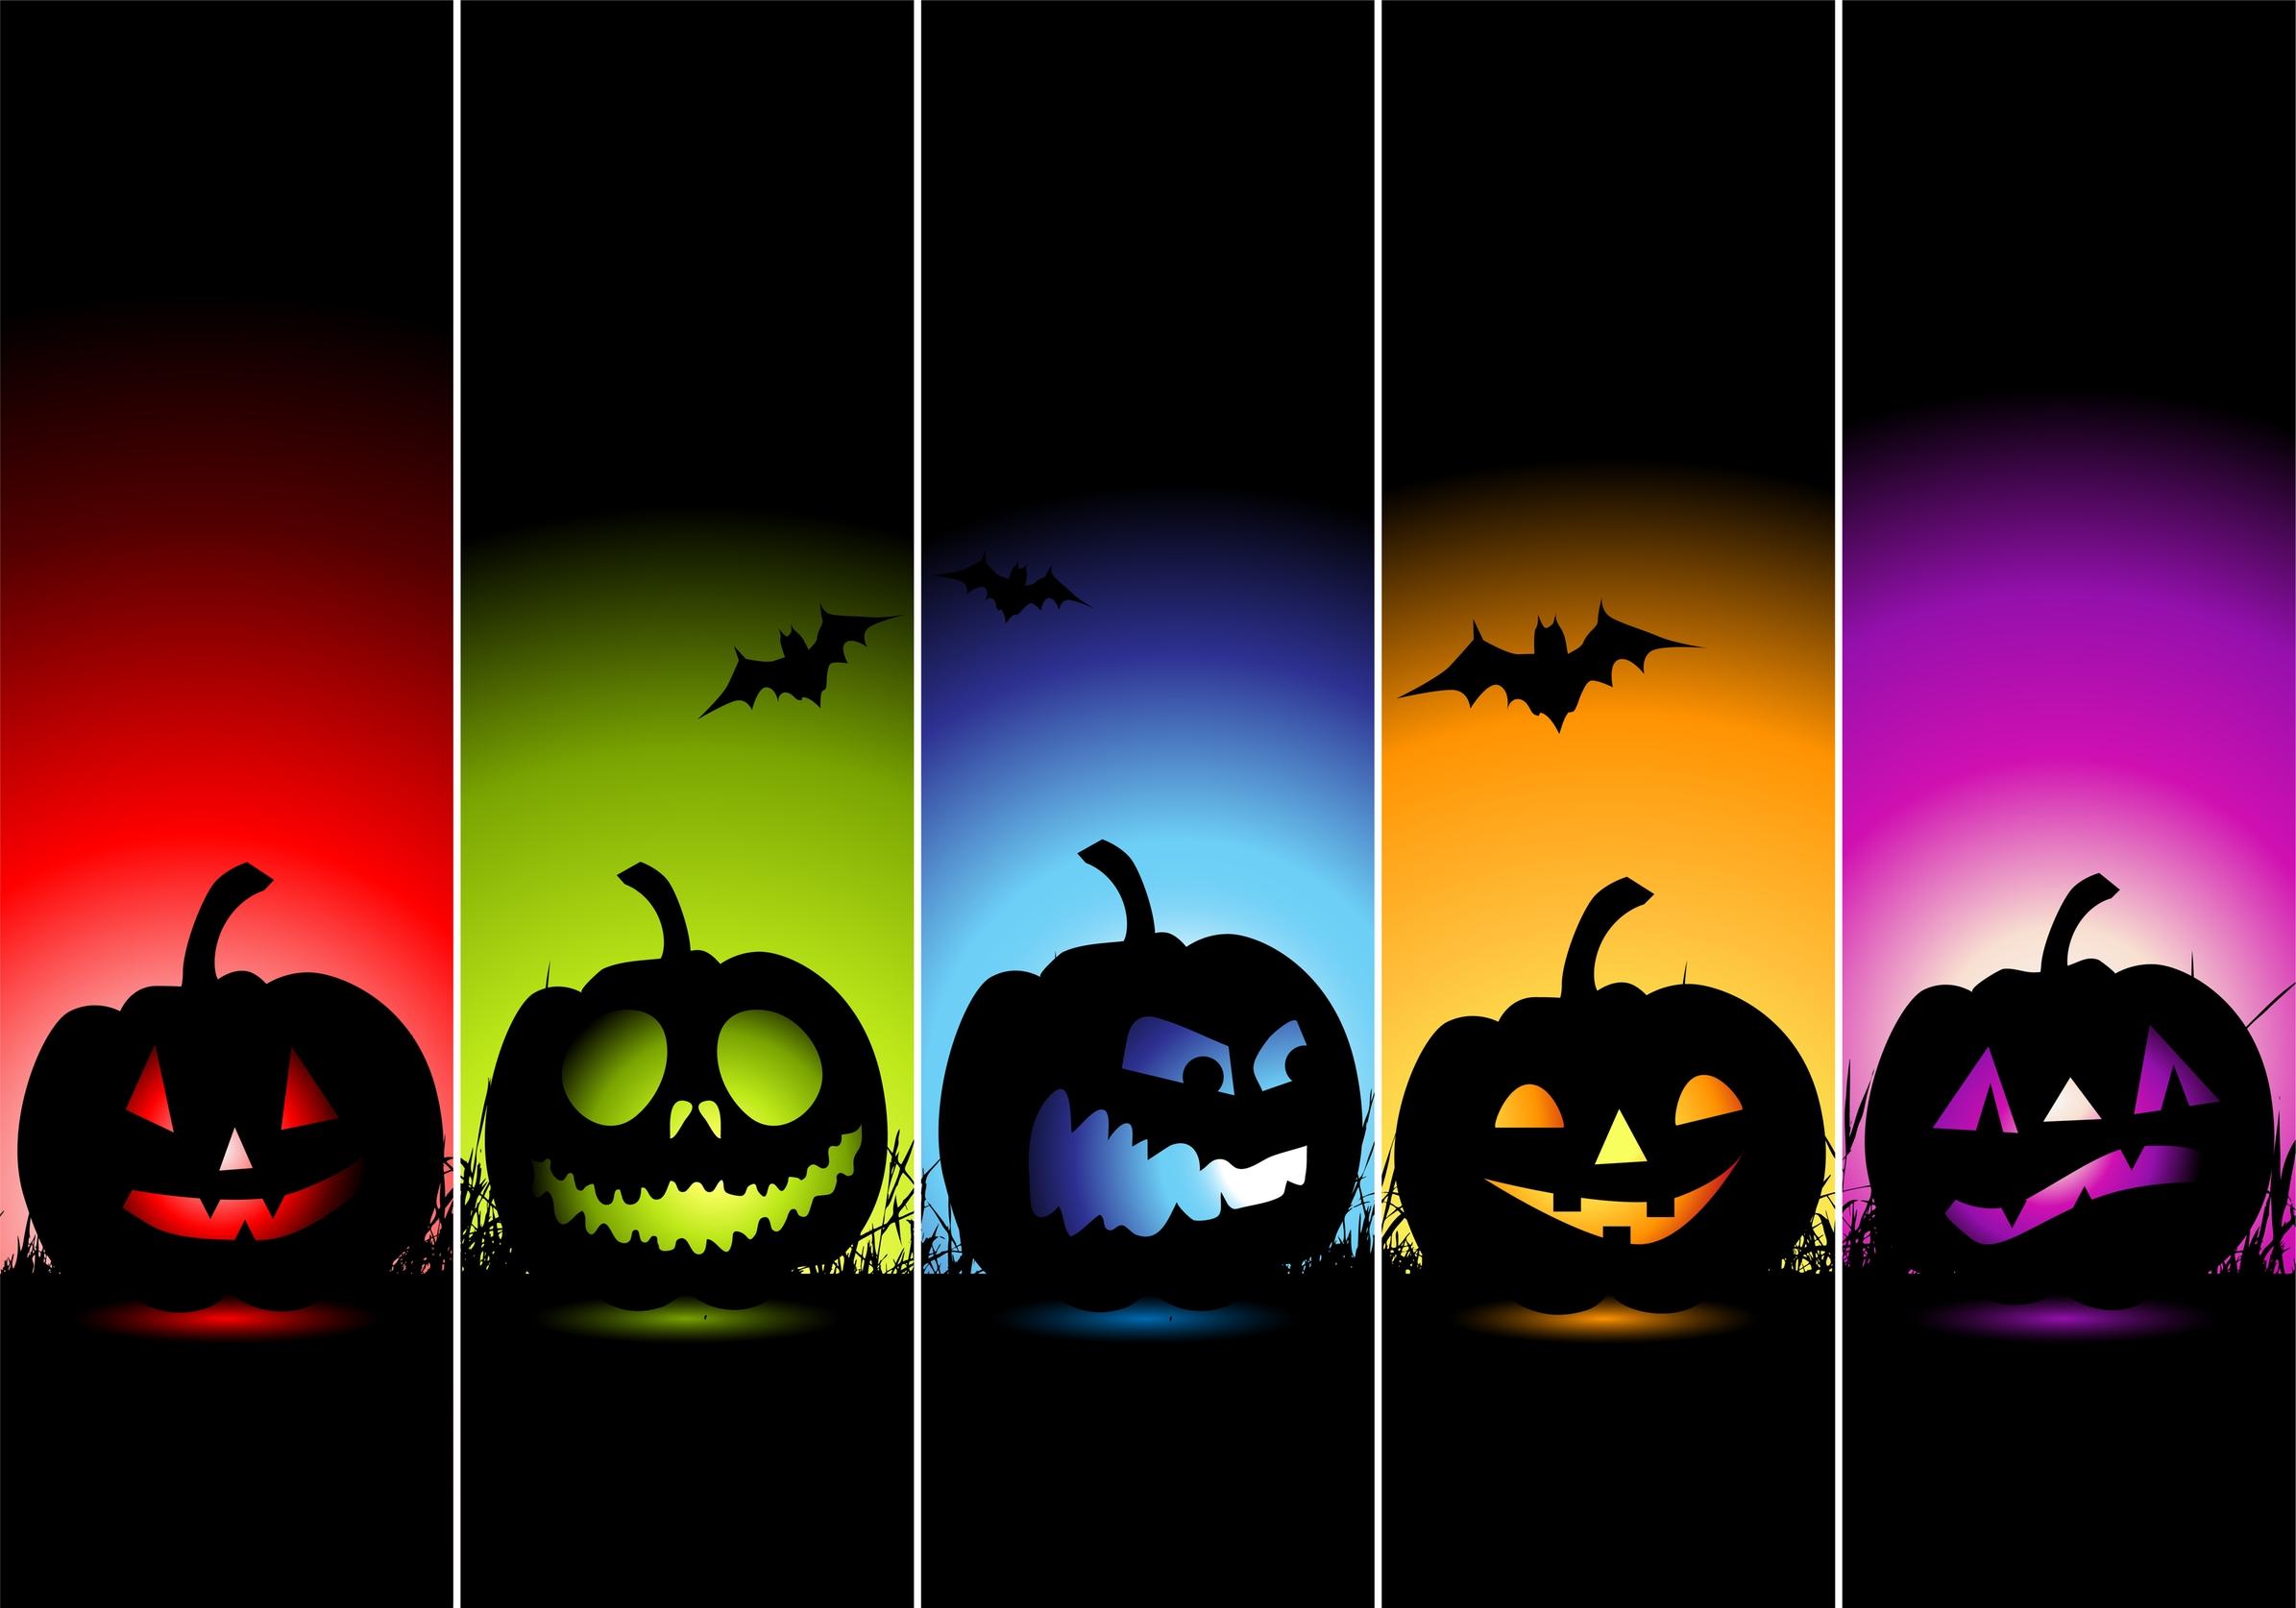 Colorful Halloween Horor Wallpaper